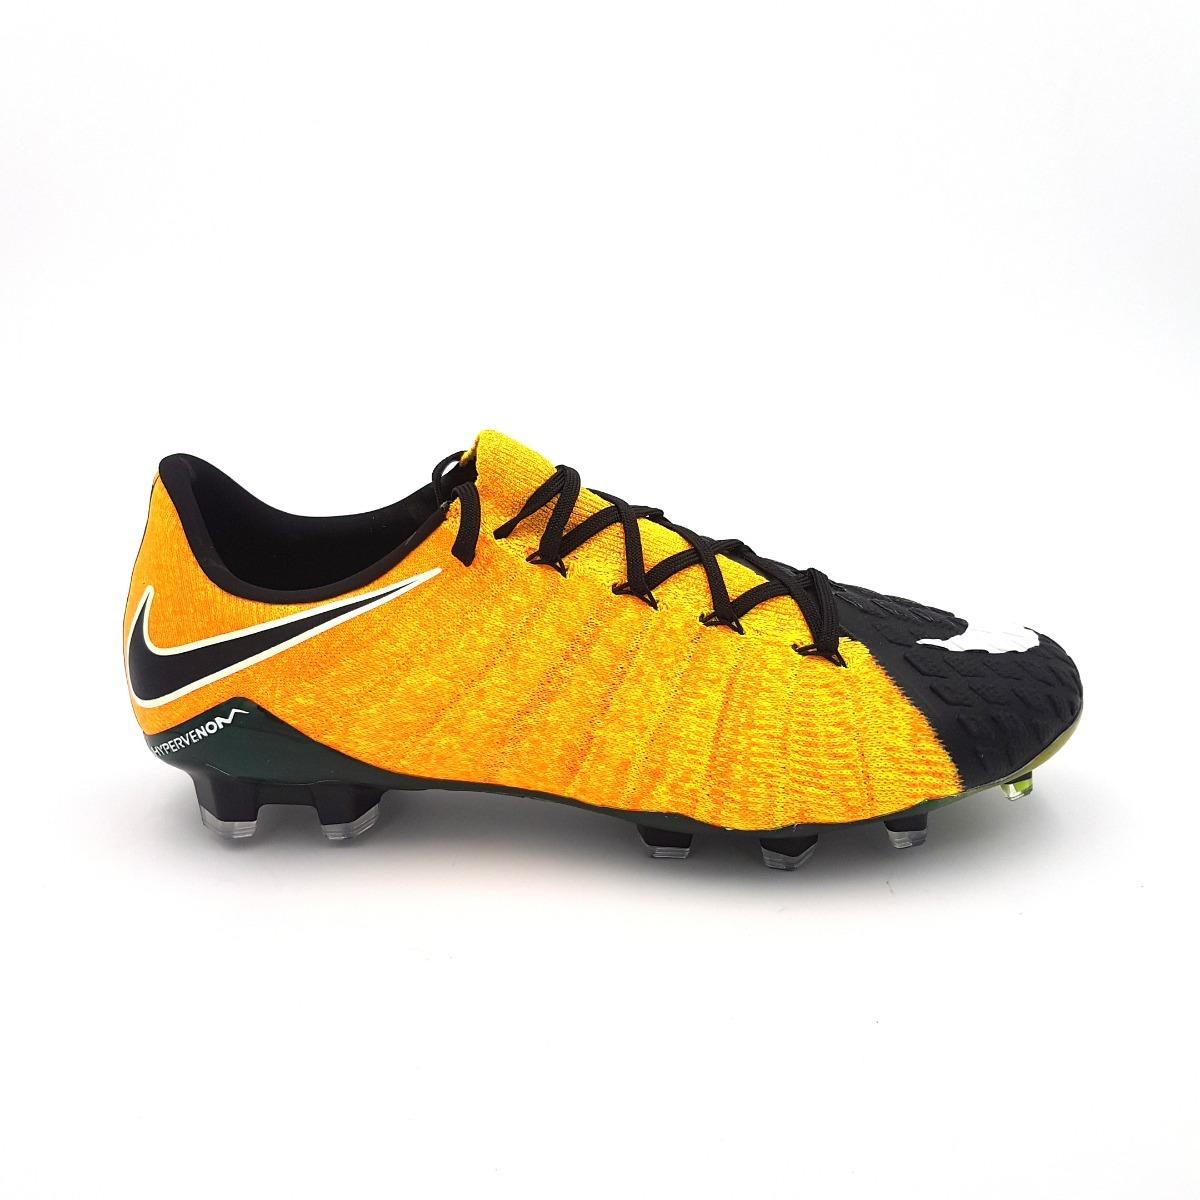 Botines Nike Hypervenom Phantom Iii fut11 fg alta Gama sale ... 861fda19fcd95